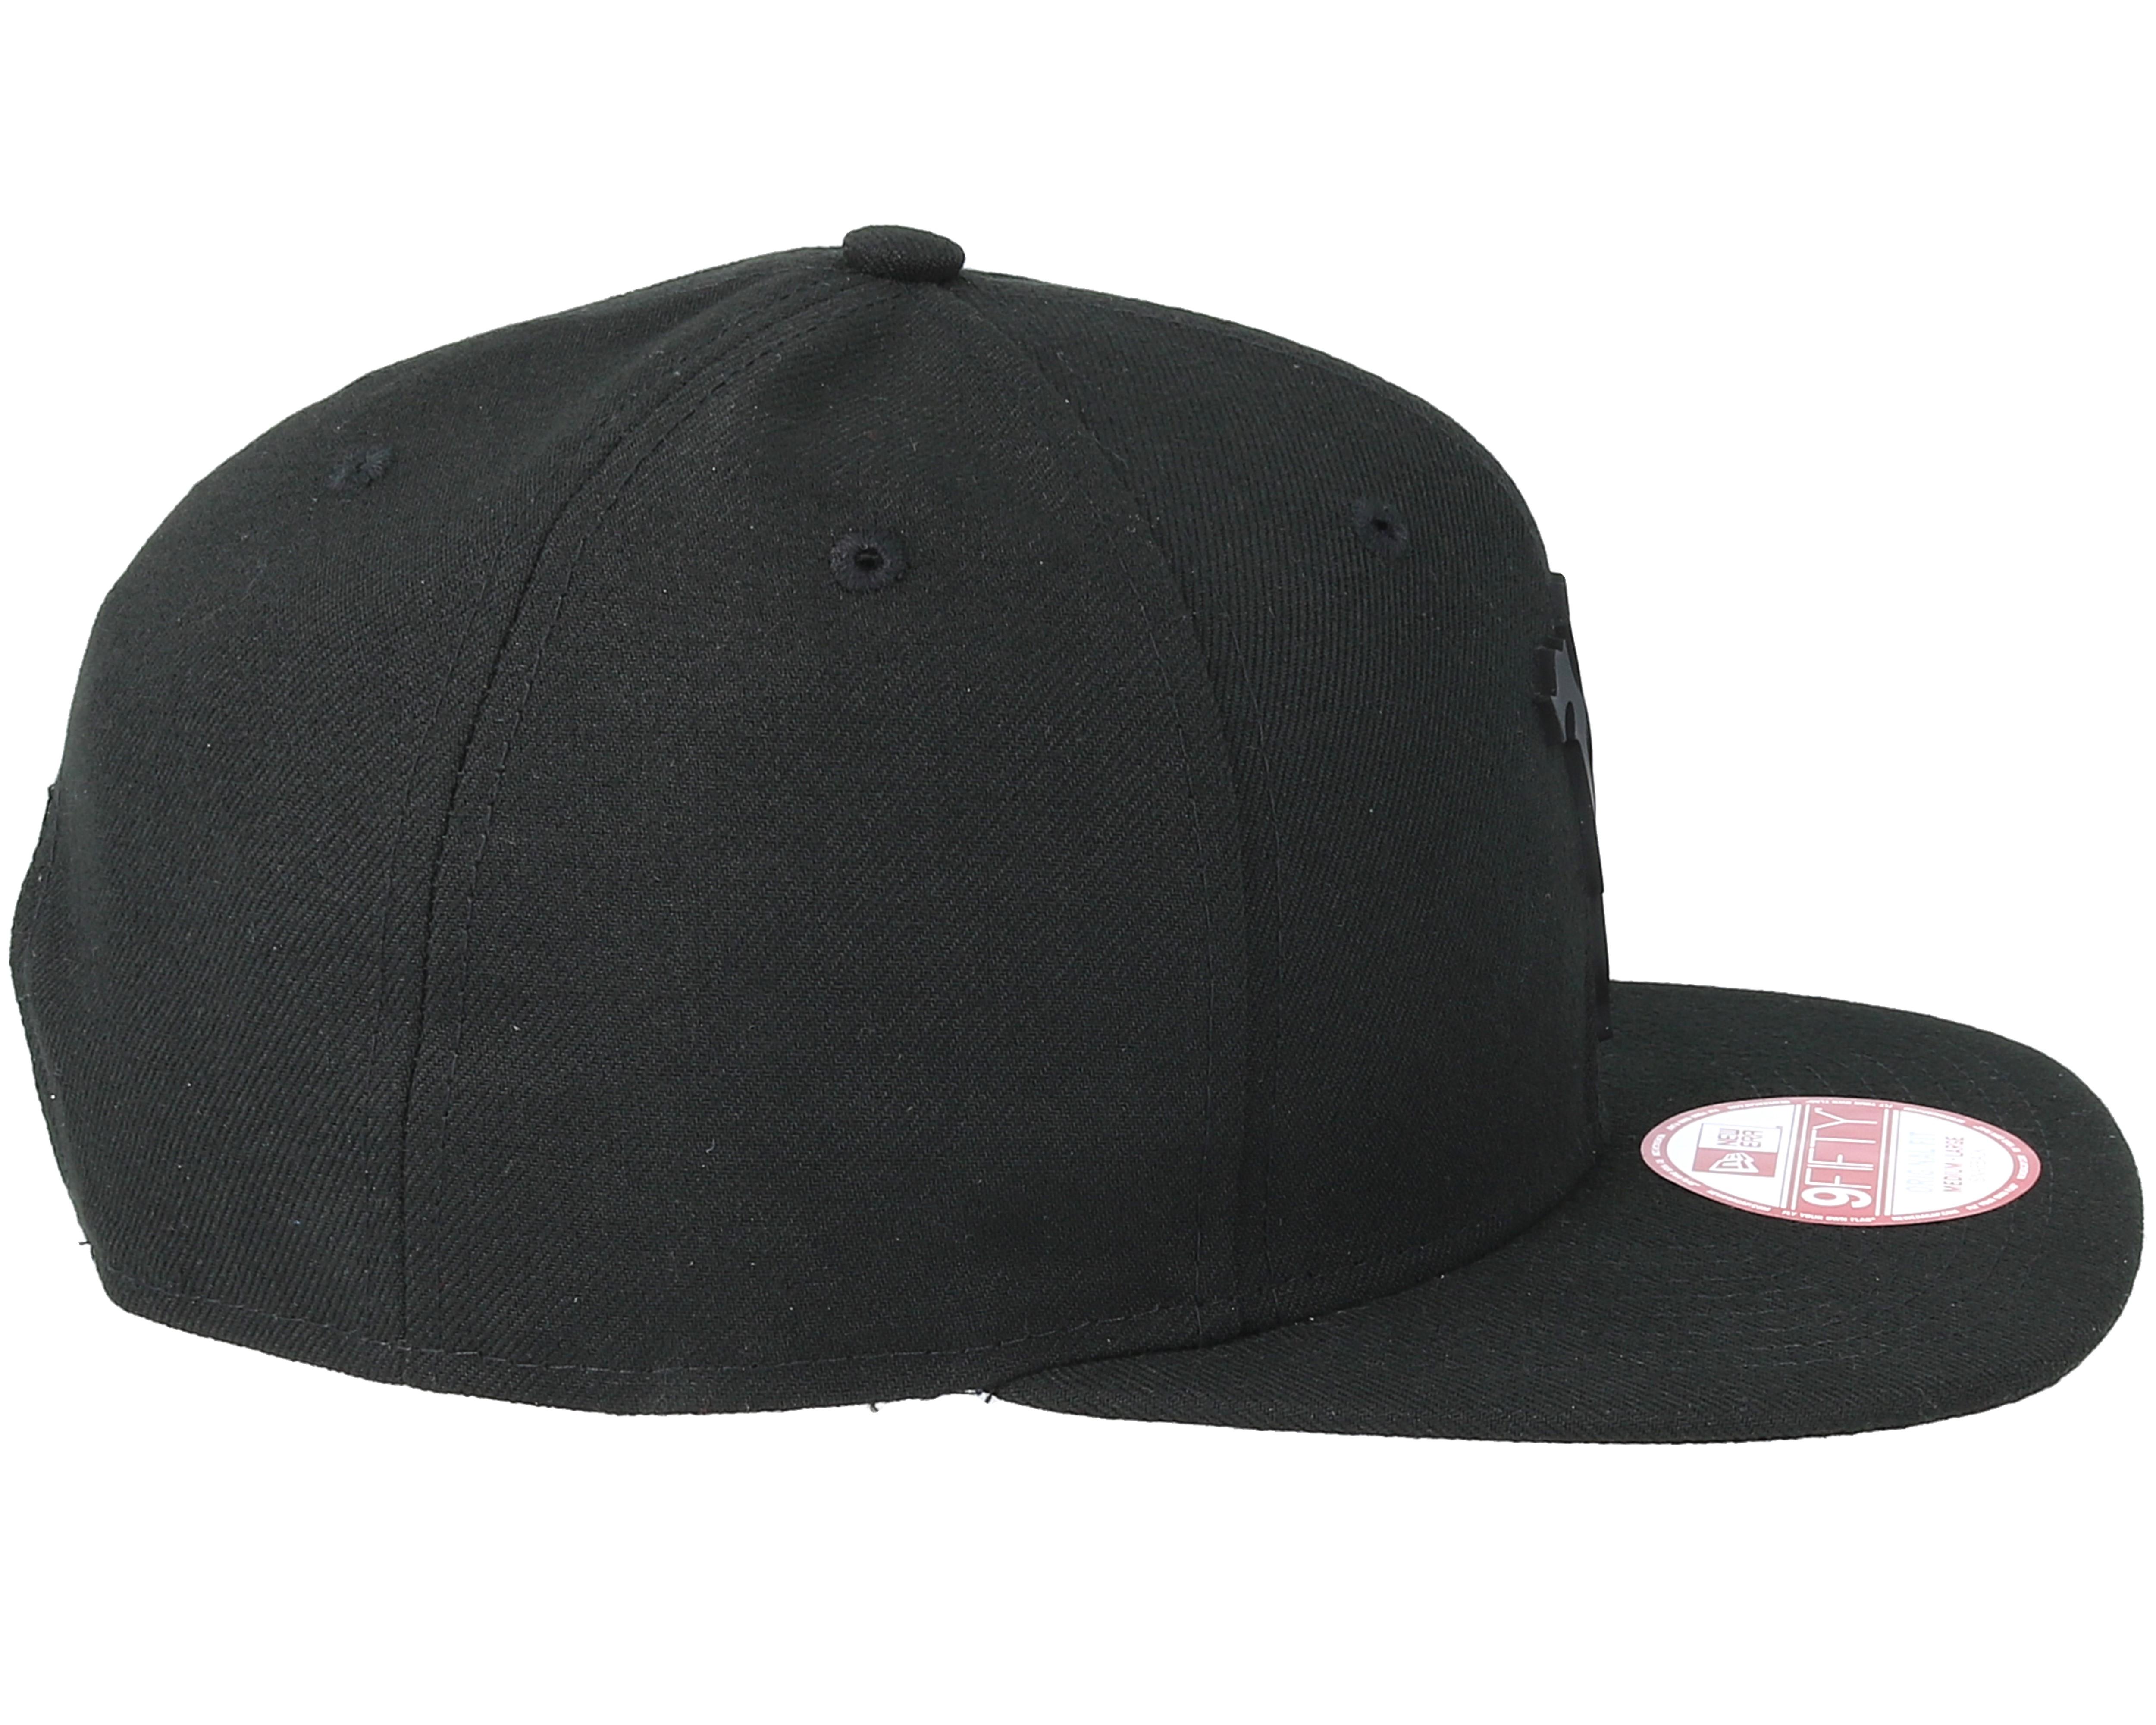 manchester united bob devil black black 9fifty snapback new era cap. Black Bedroom Furniture Sets. Home Design Ideas